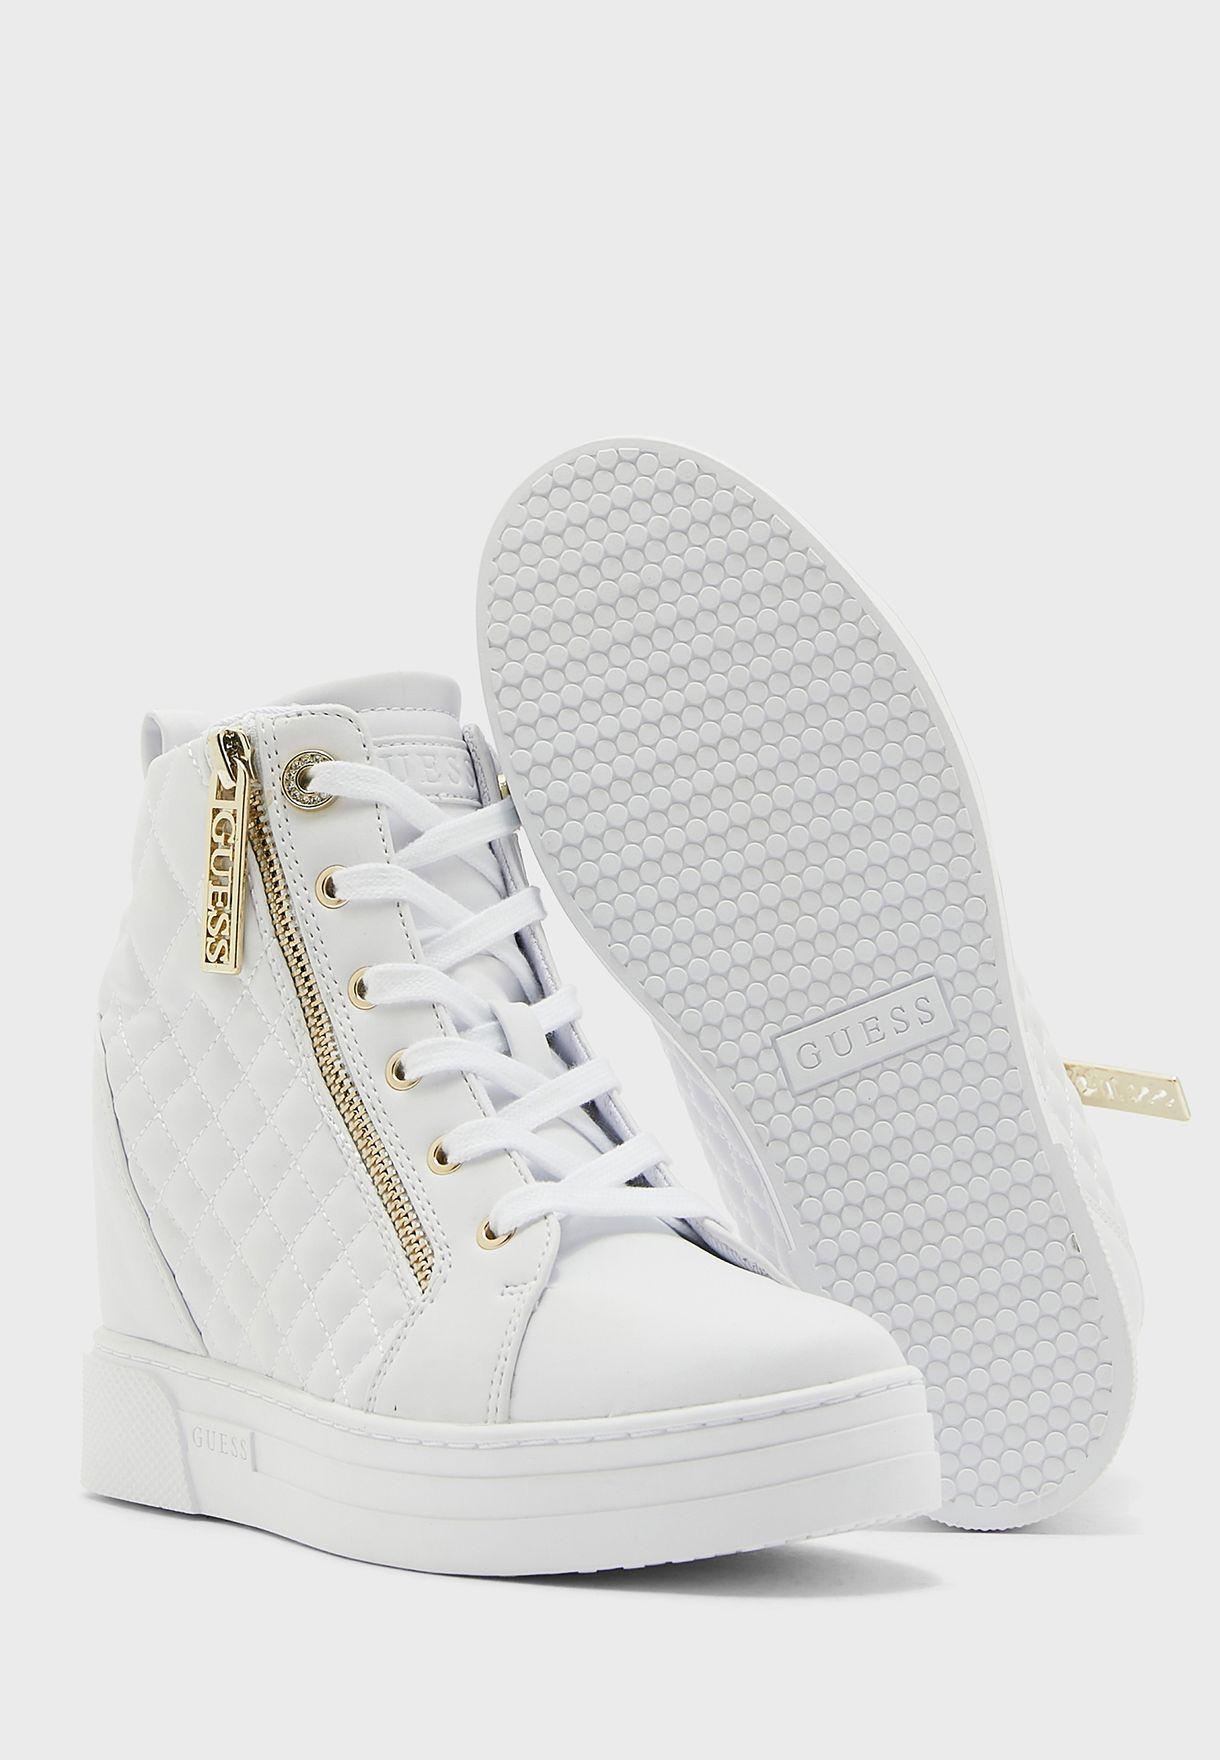 Fazed High Top Sneakers